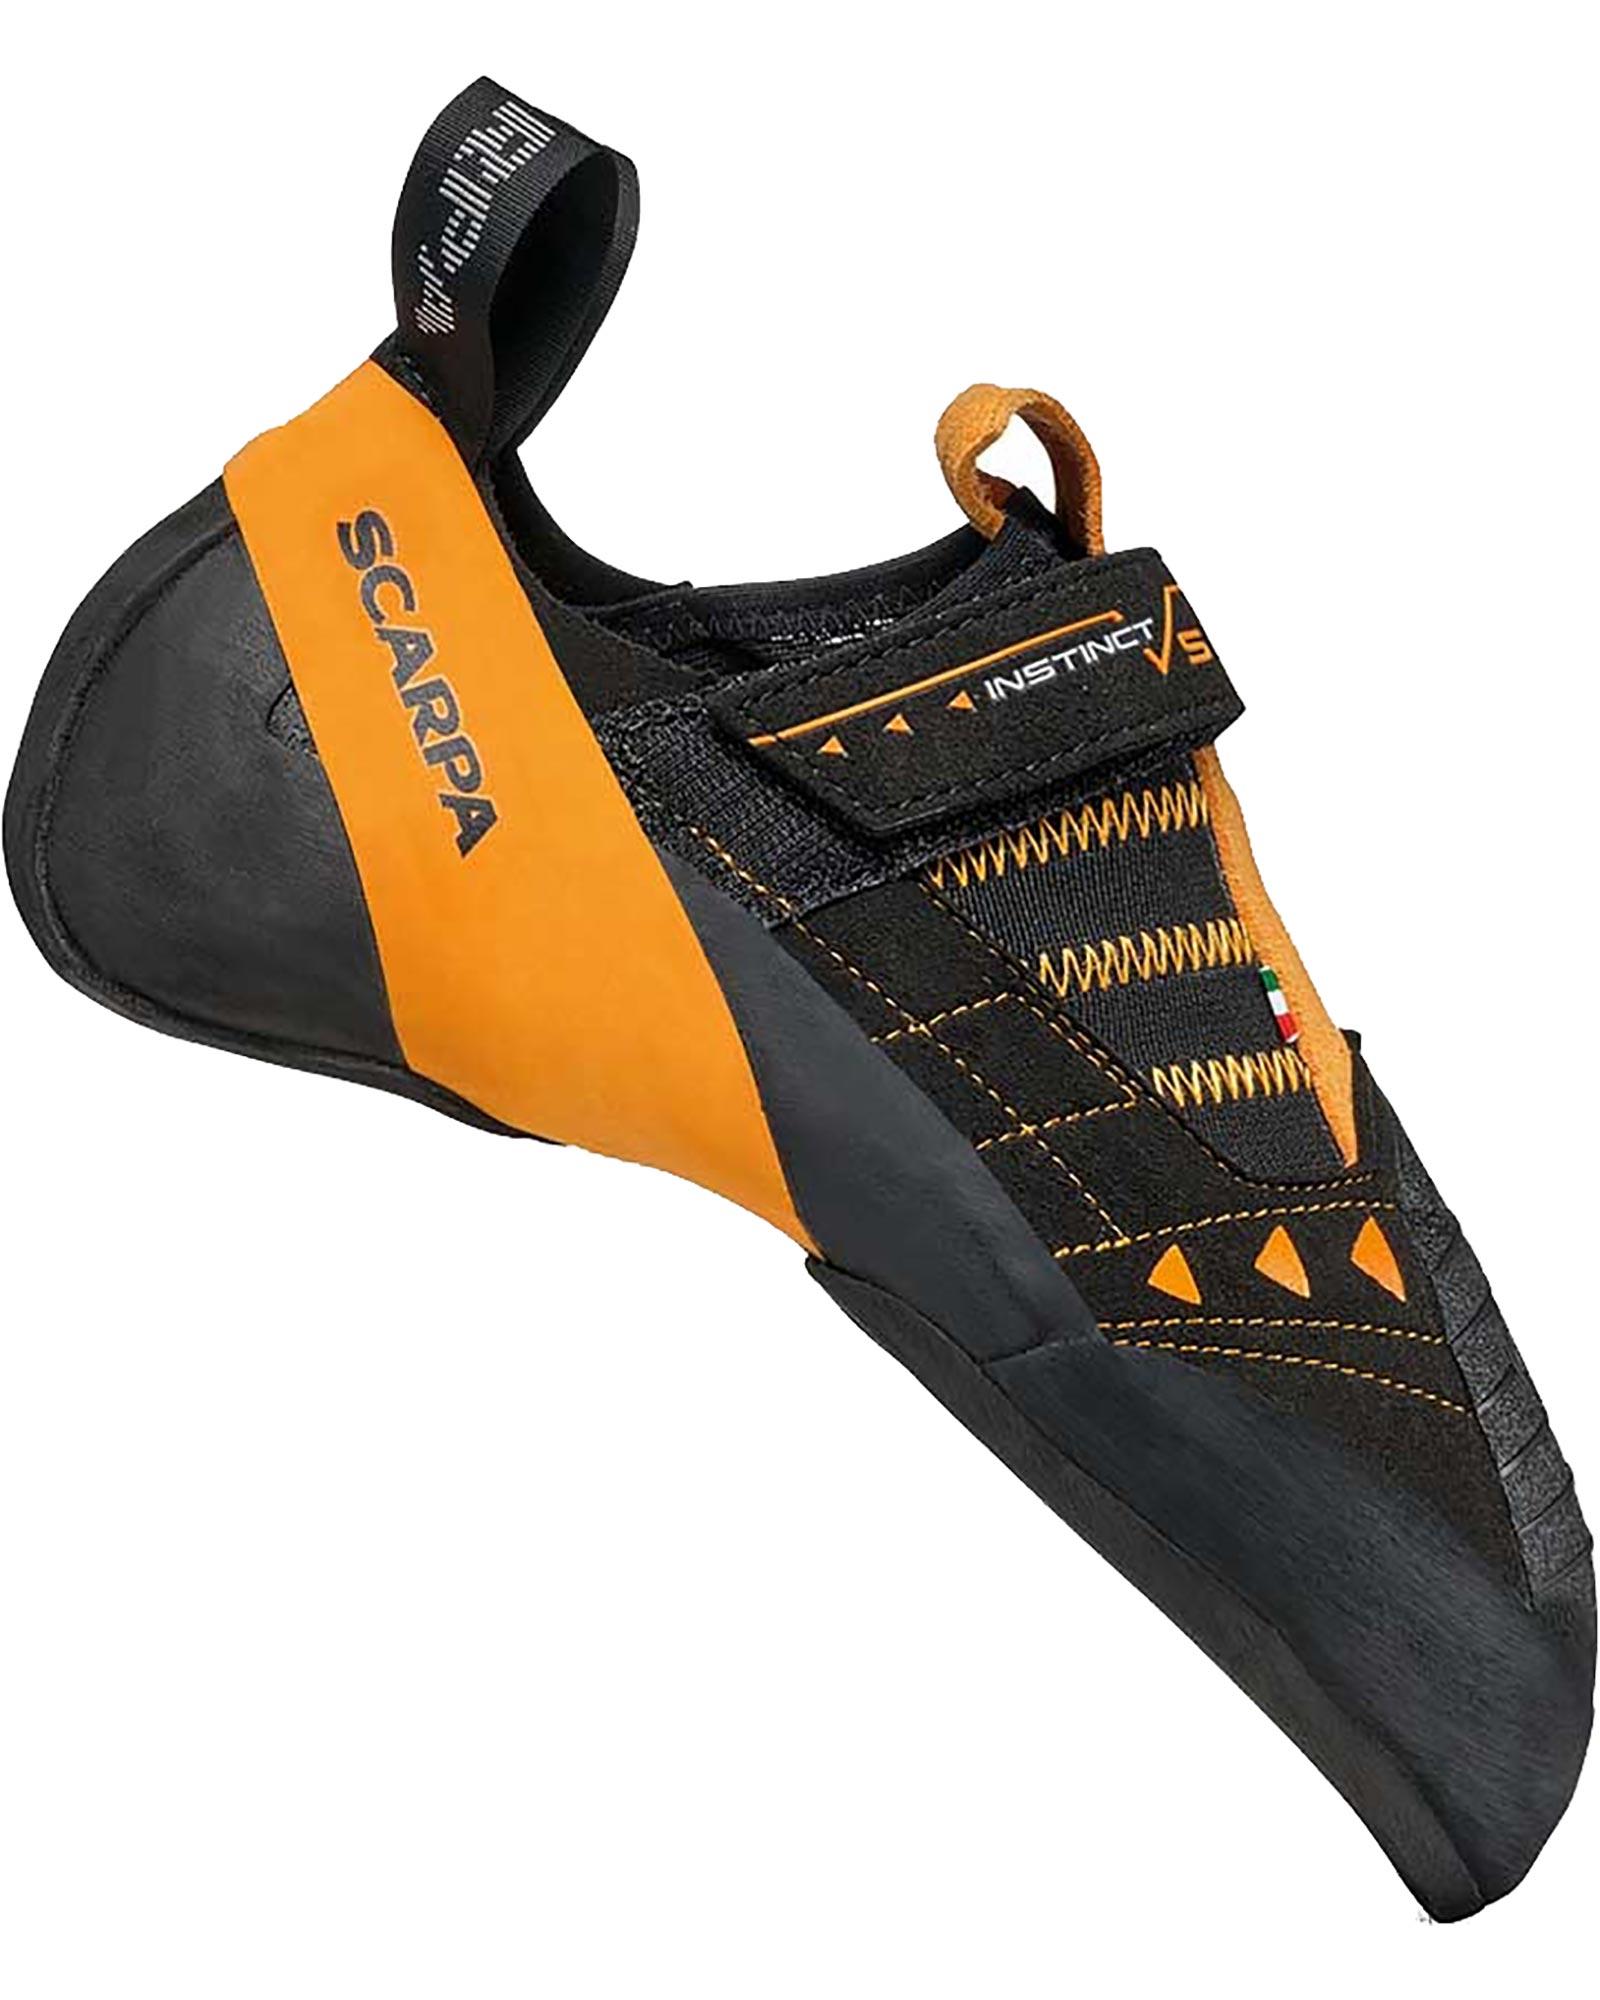 Scarpa Instinct VS Climbing Shoes 0